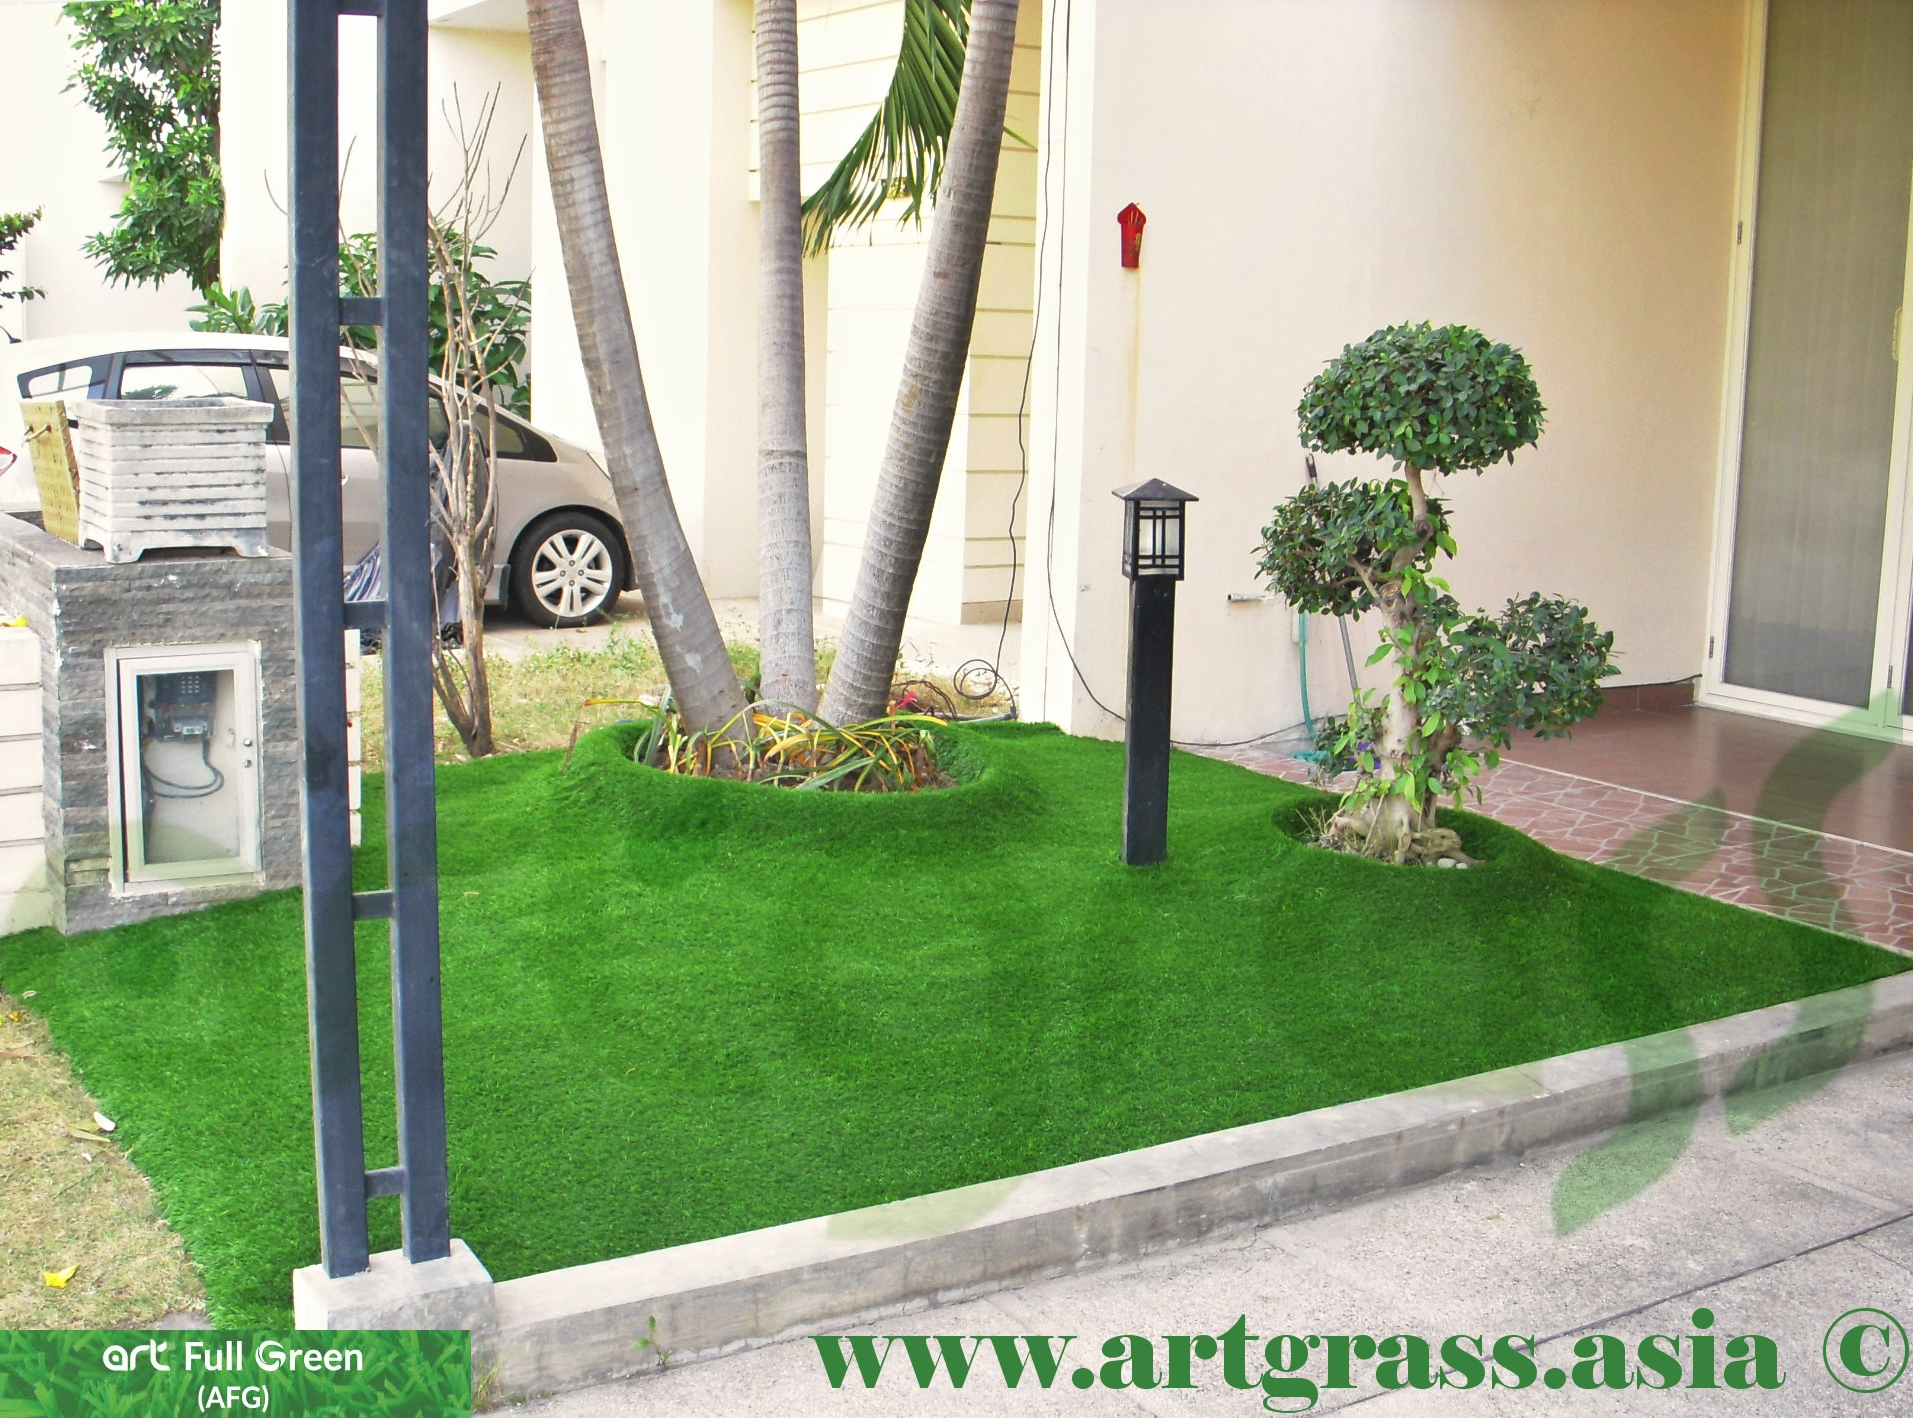 Artgrass Rumput Sintetis Taman Rumput Sintetis Taman